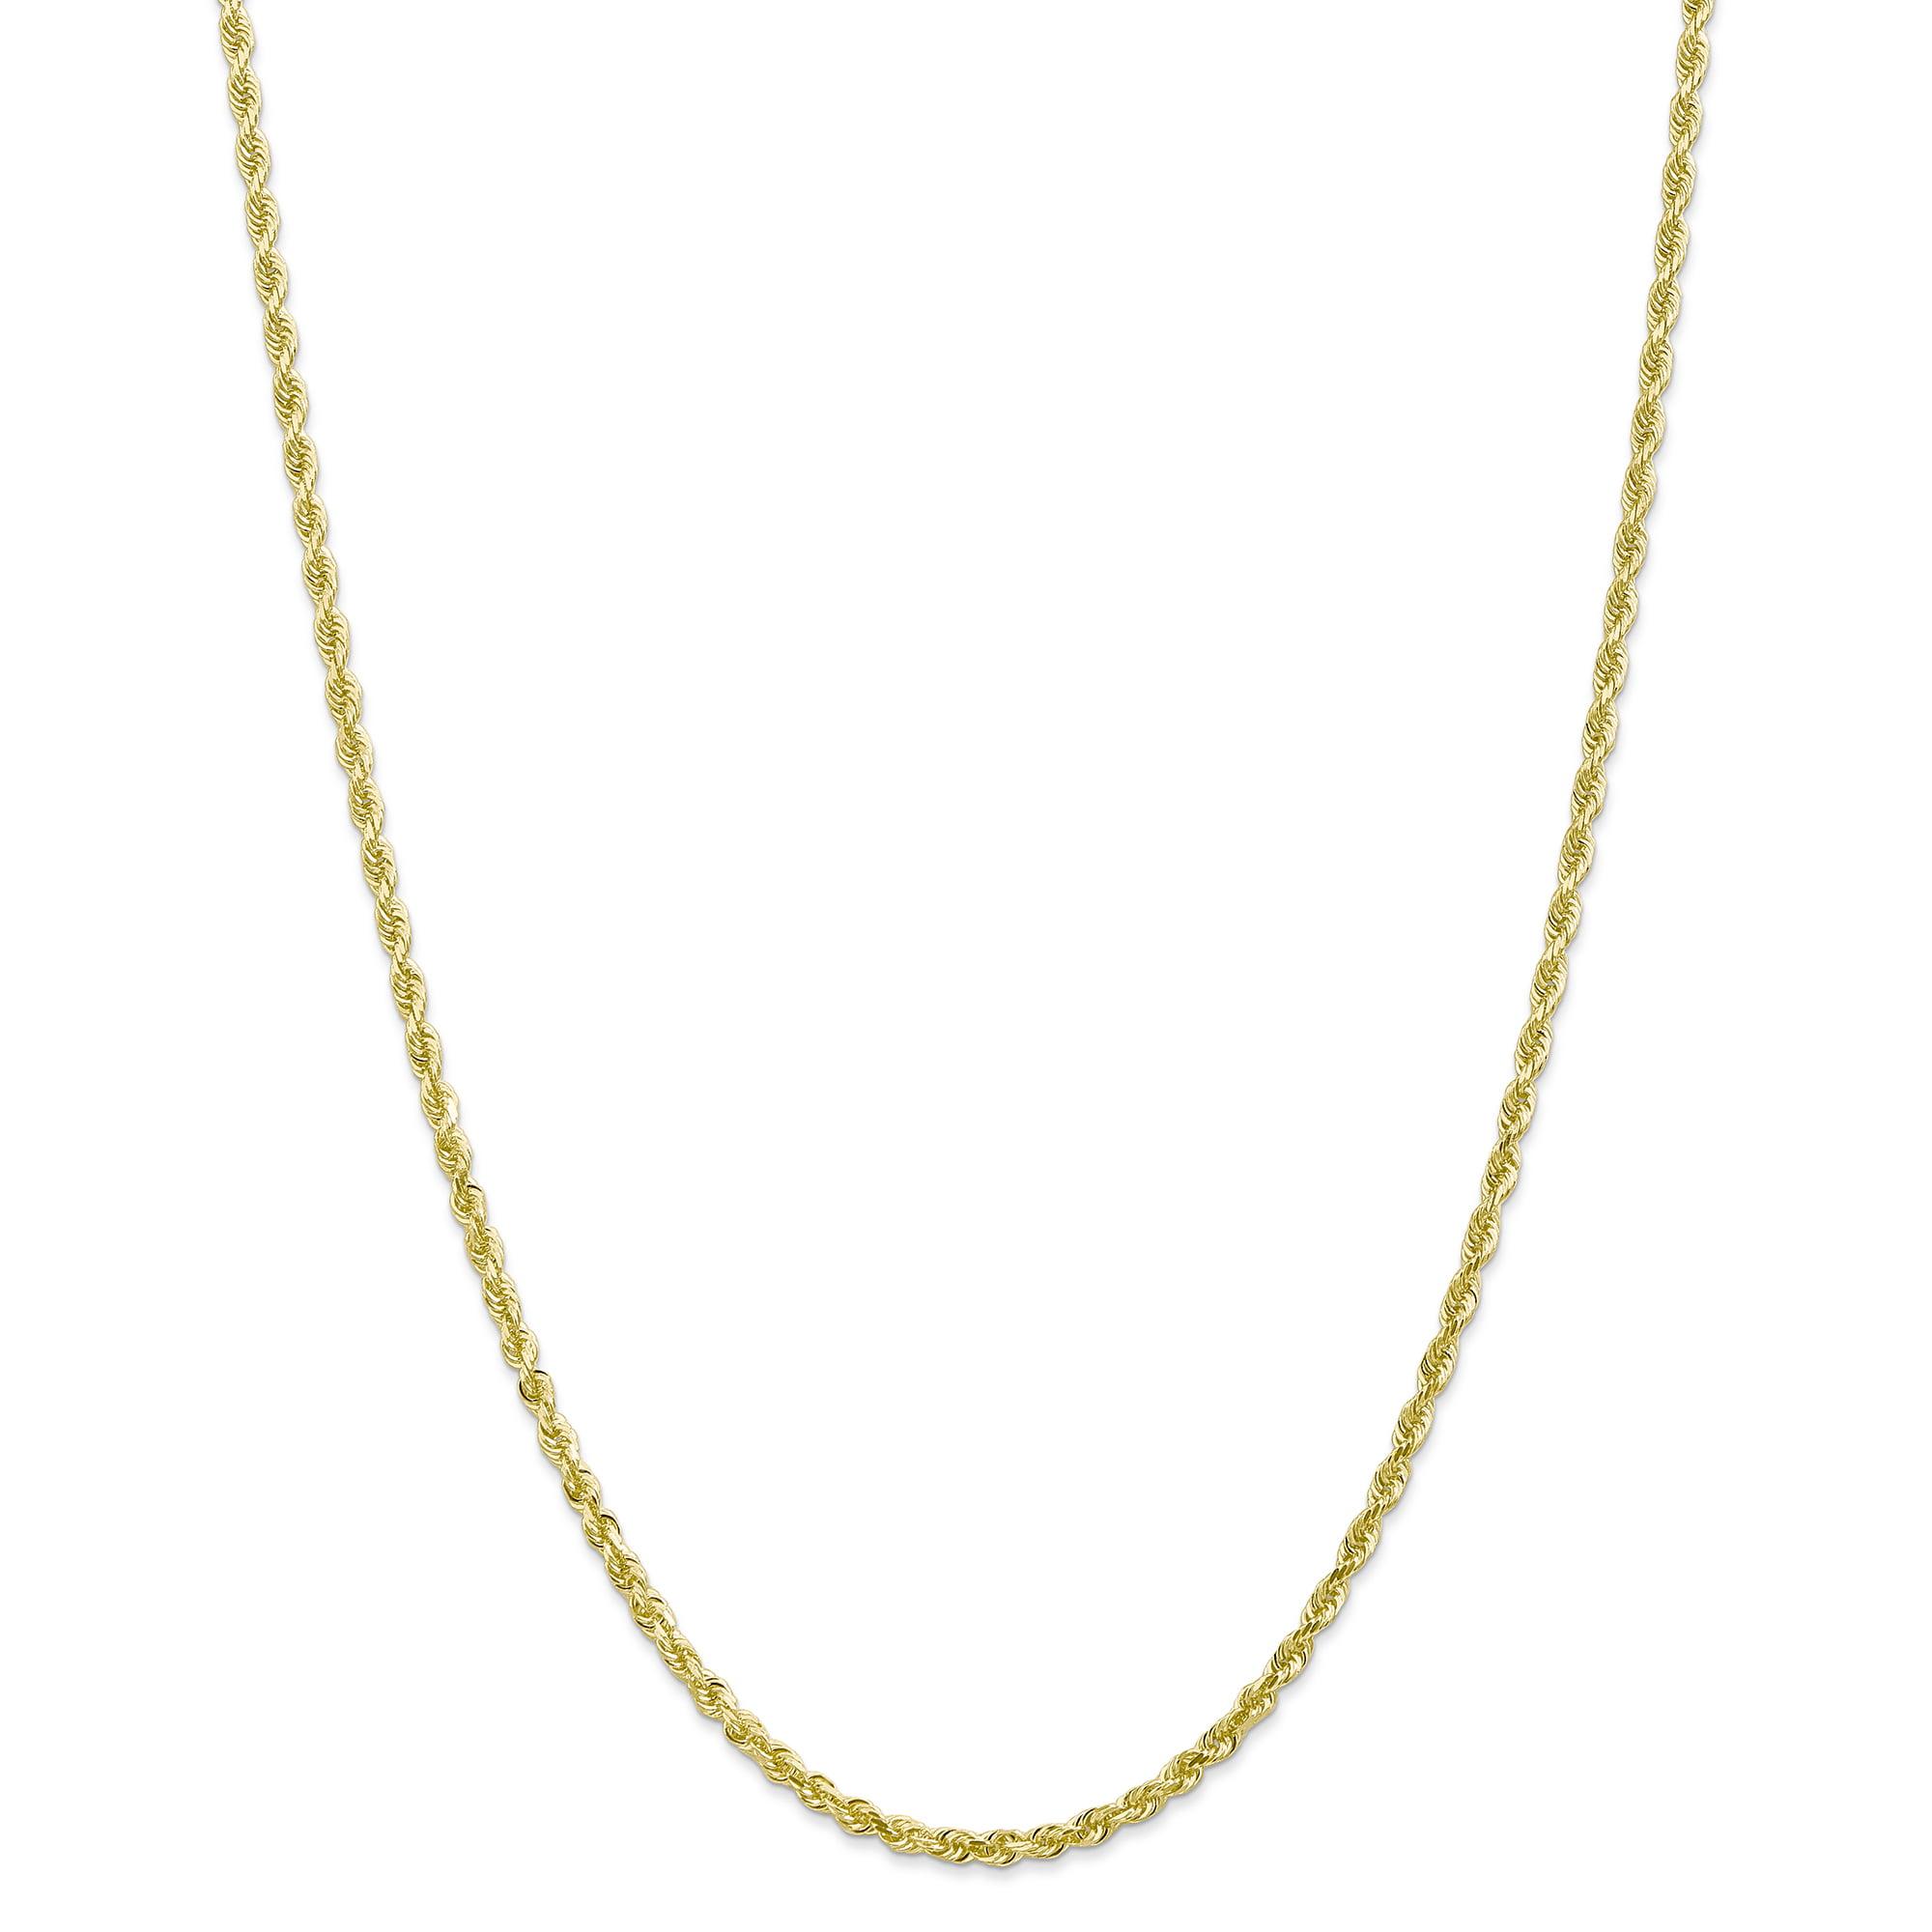 10K Yellow Gold 3.0mm Diamond Cut Quadruple Rope Chain 18 Inch - image 5 of 5